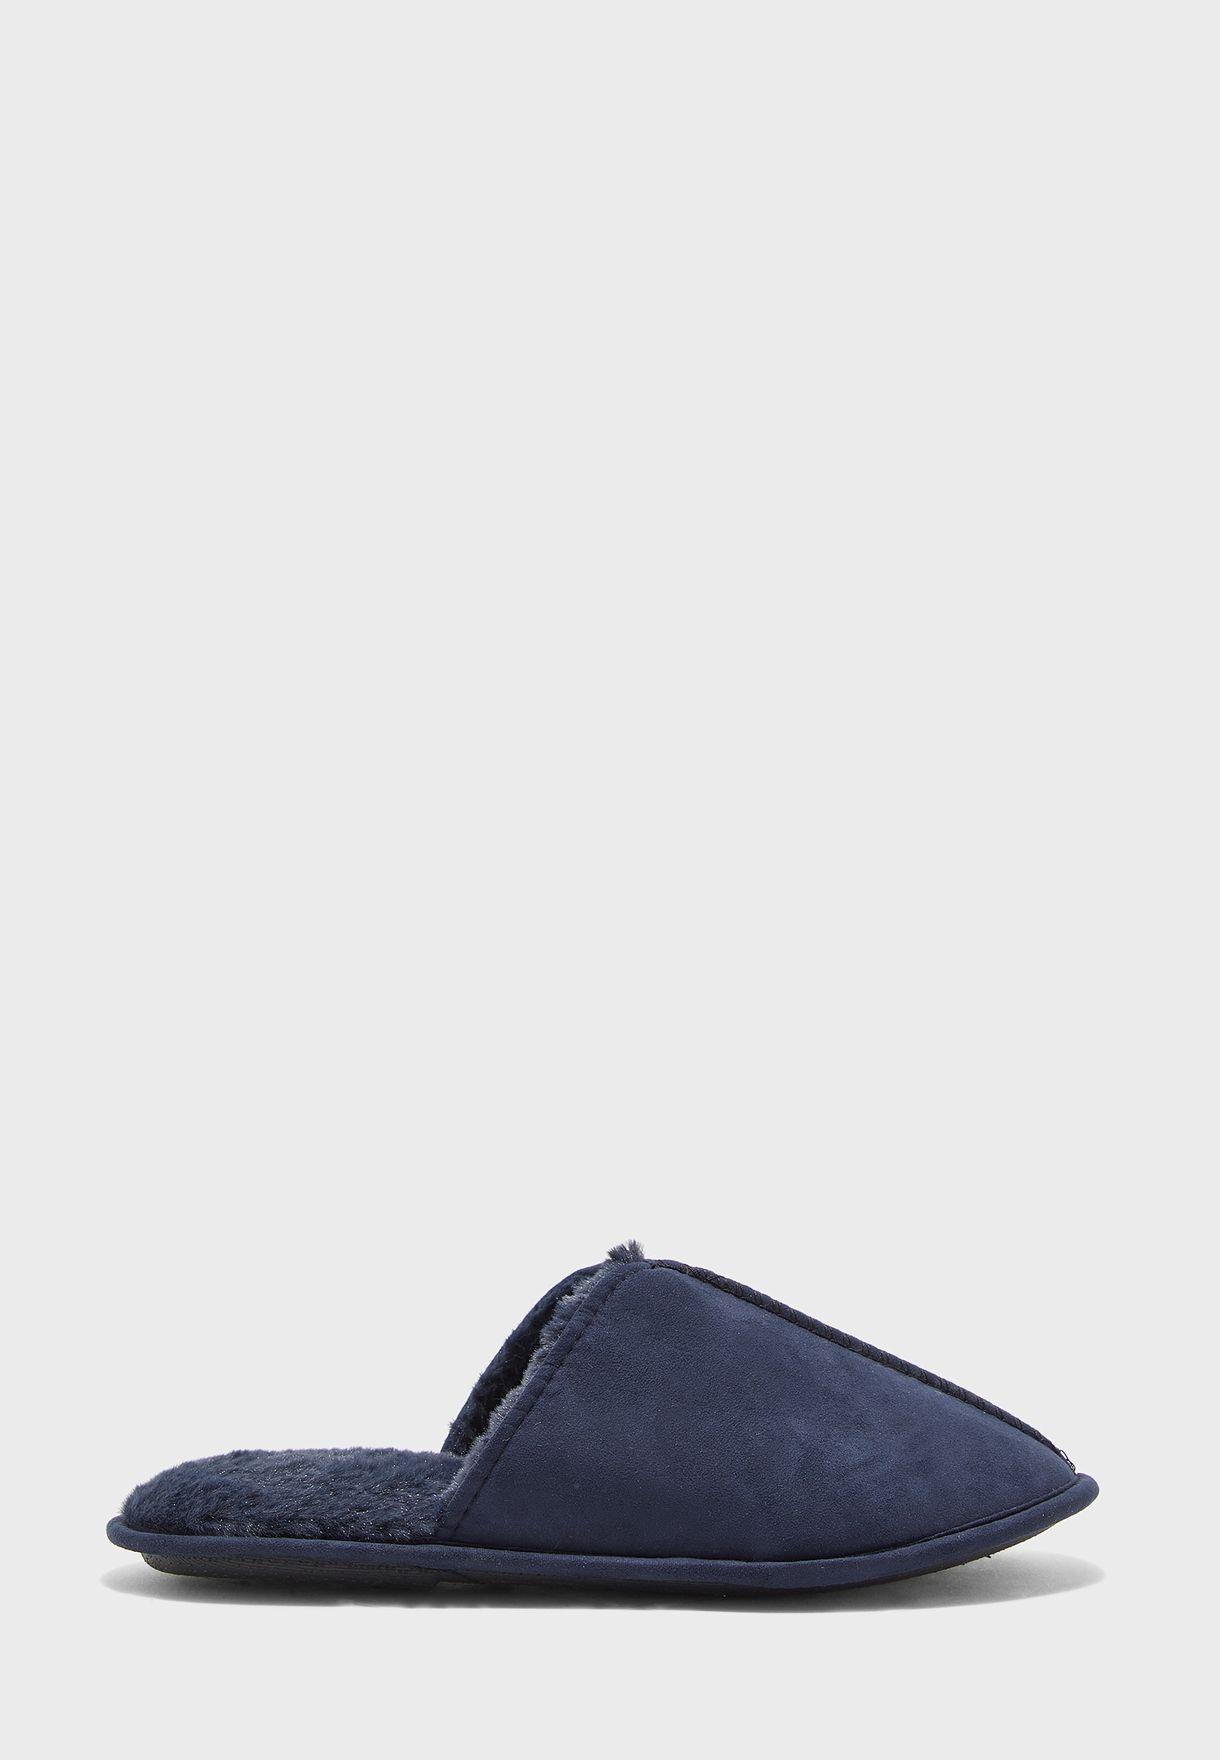 Micro Suede Bedroom Slippers